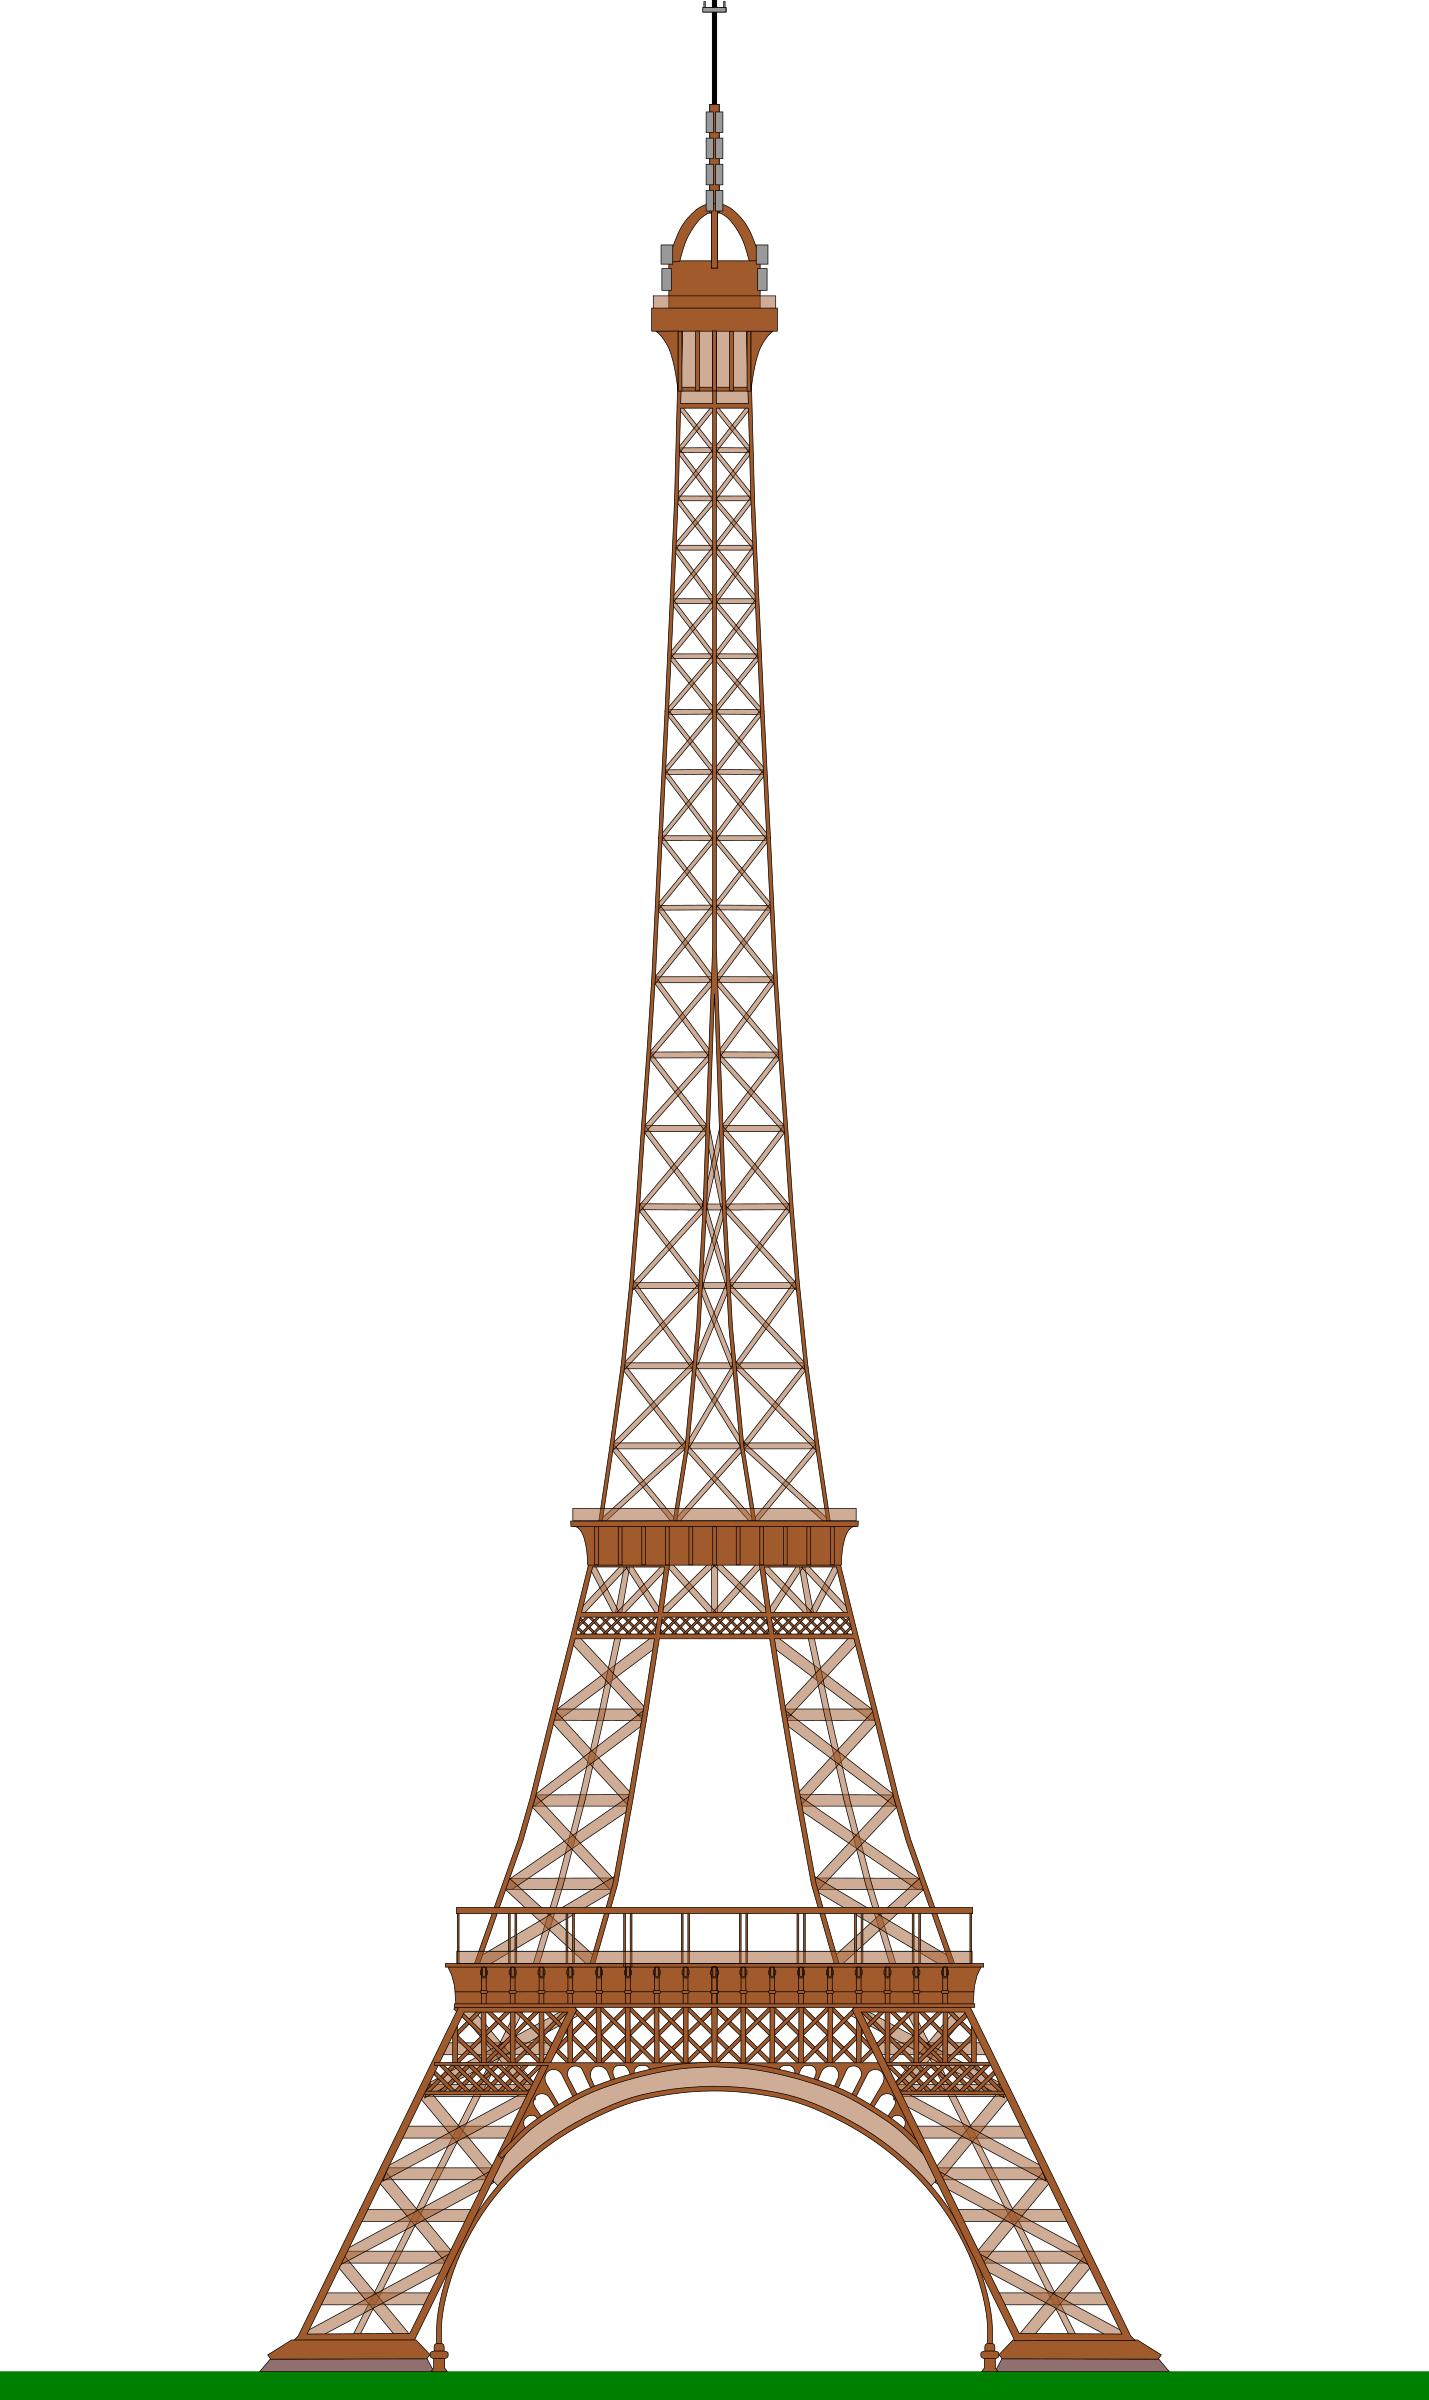 Clipart - Eiffel Tower (Paris)